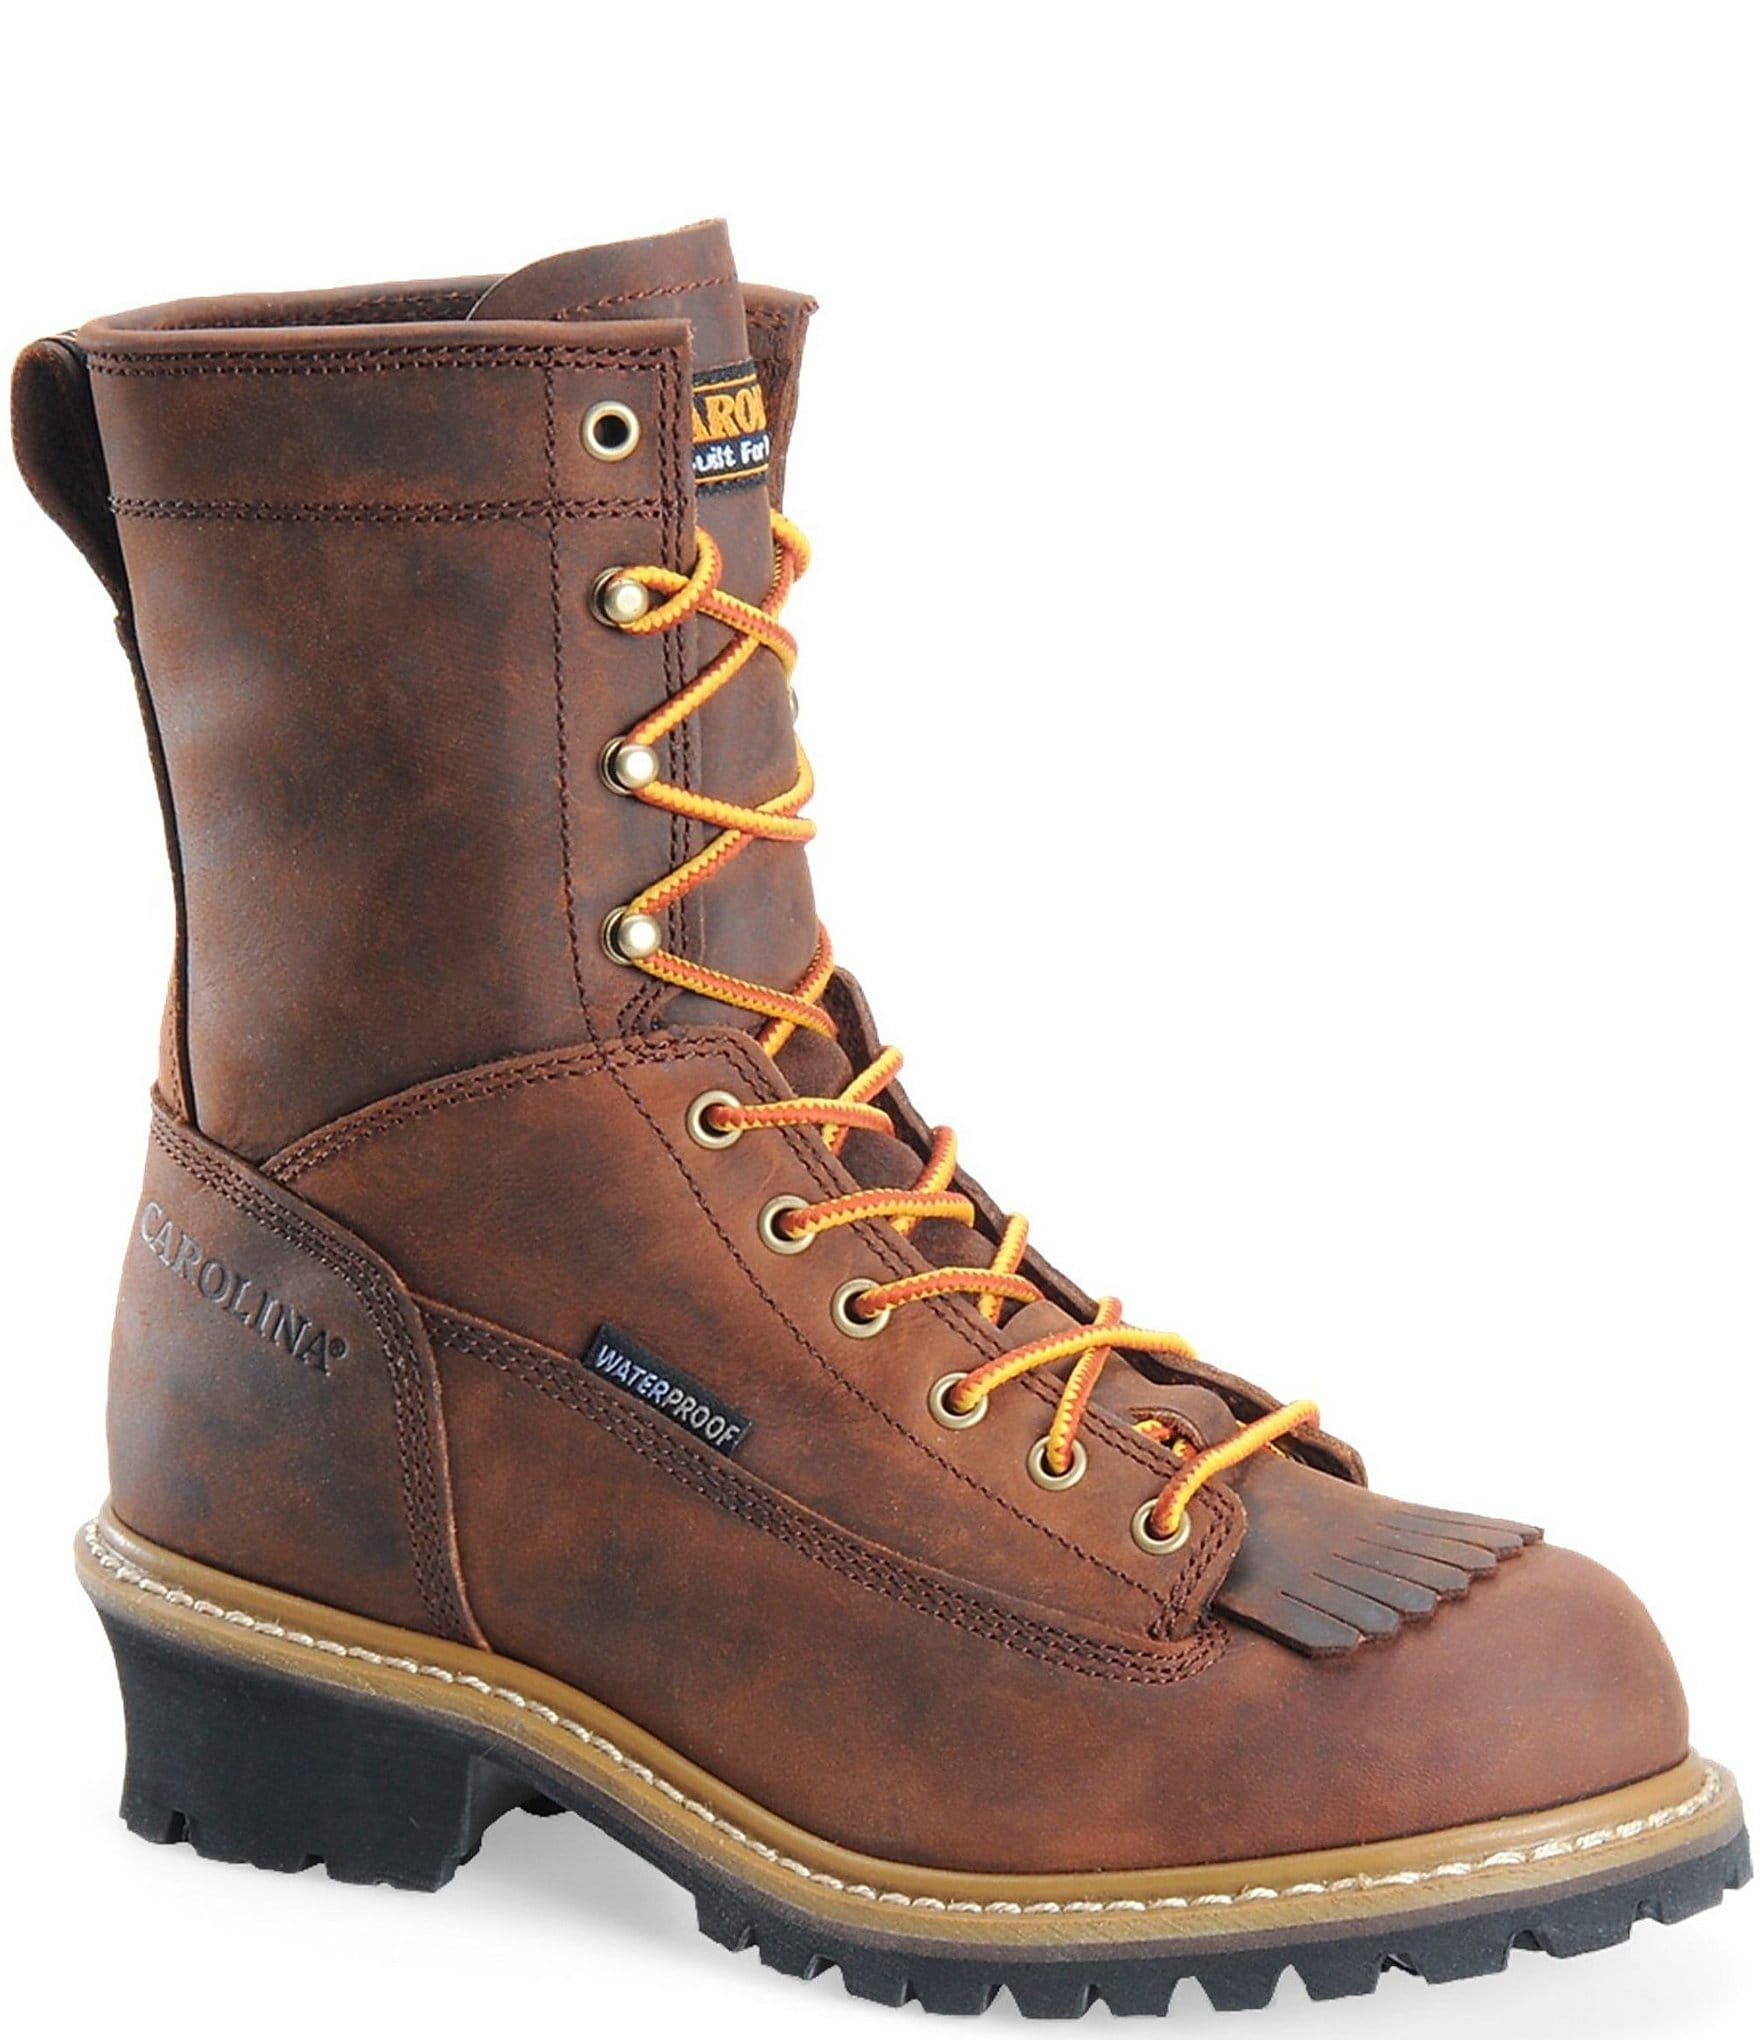 552fc6df2a4 Carolina Men's Spruce 8#double; Waterproof Logger Work Boots